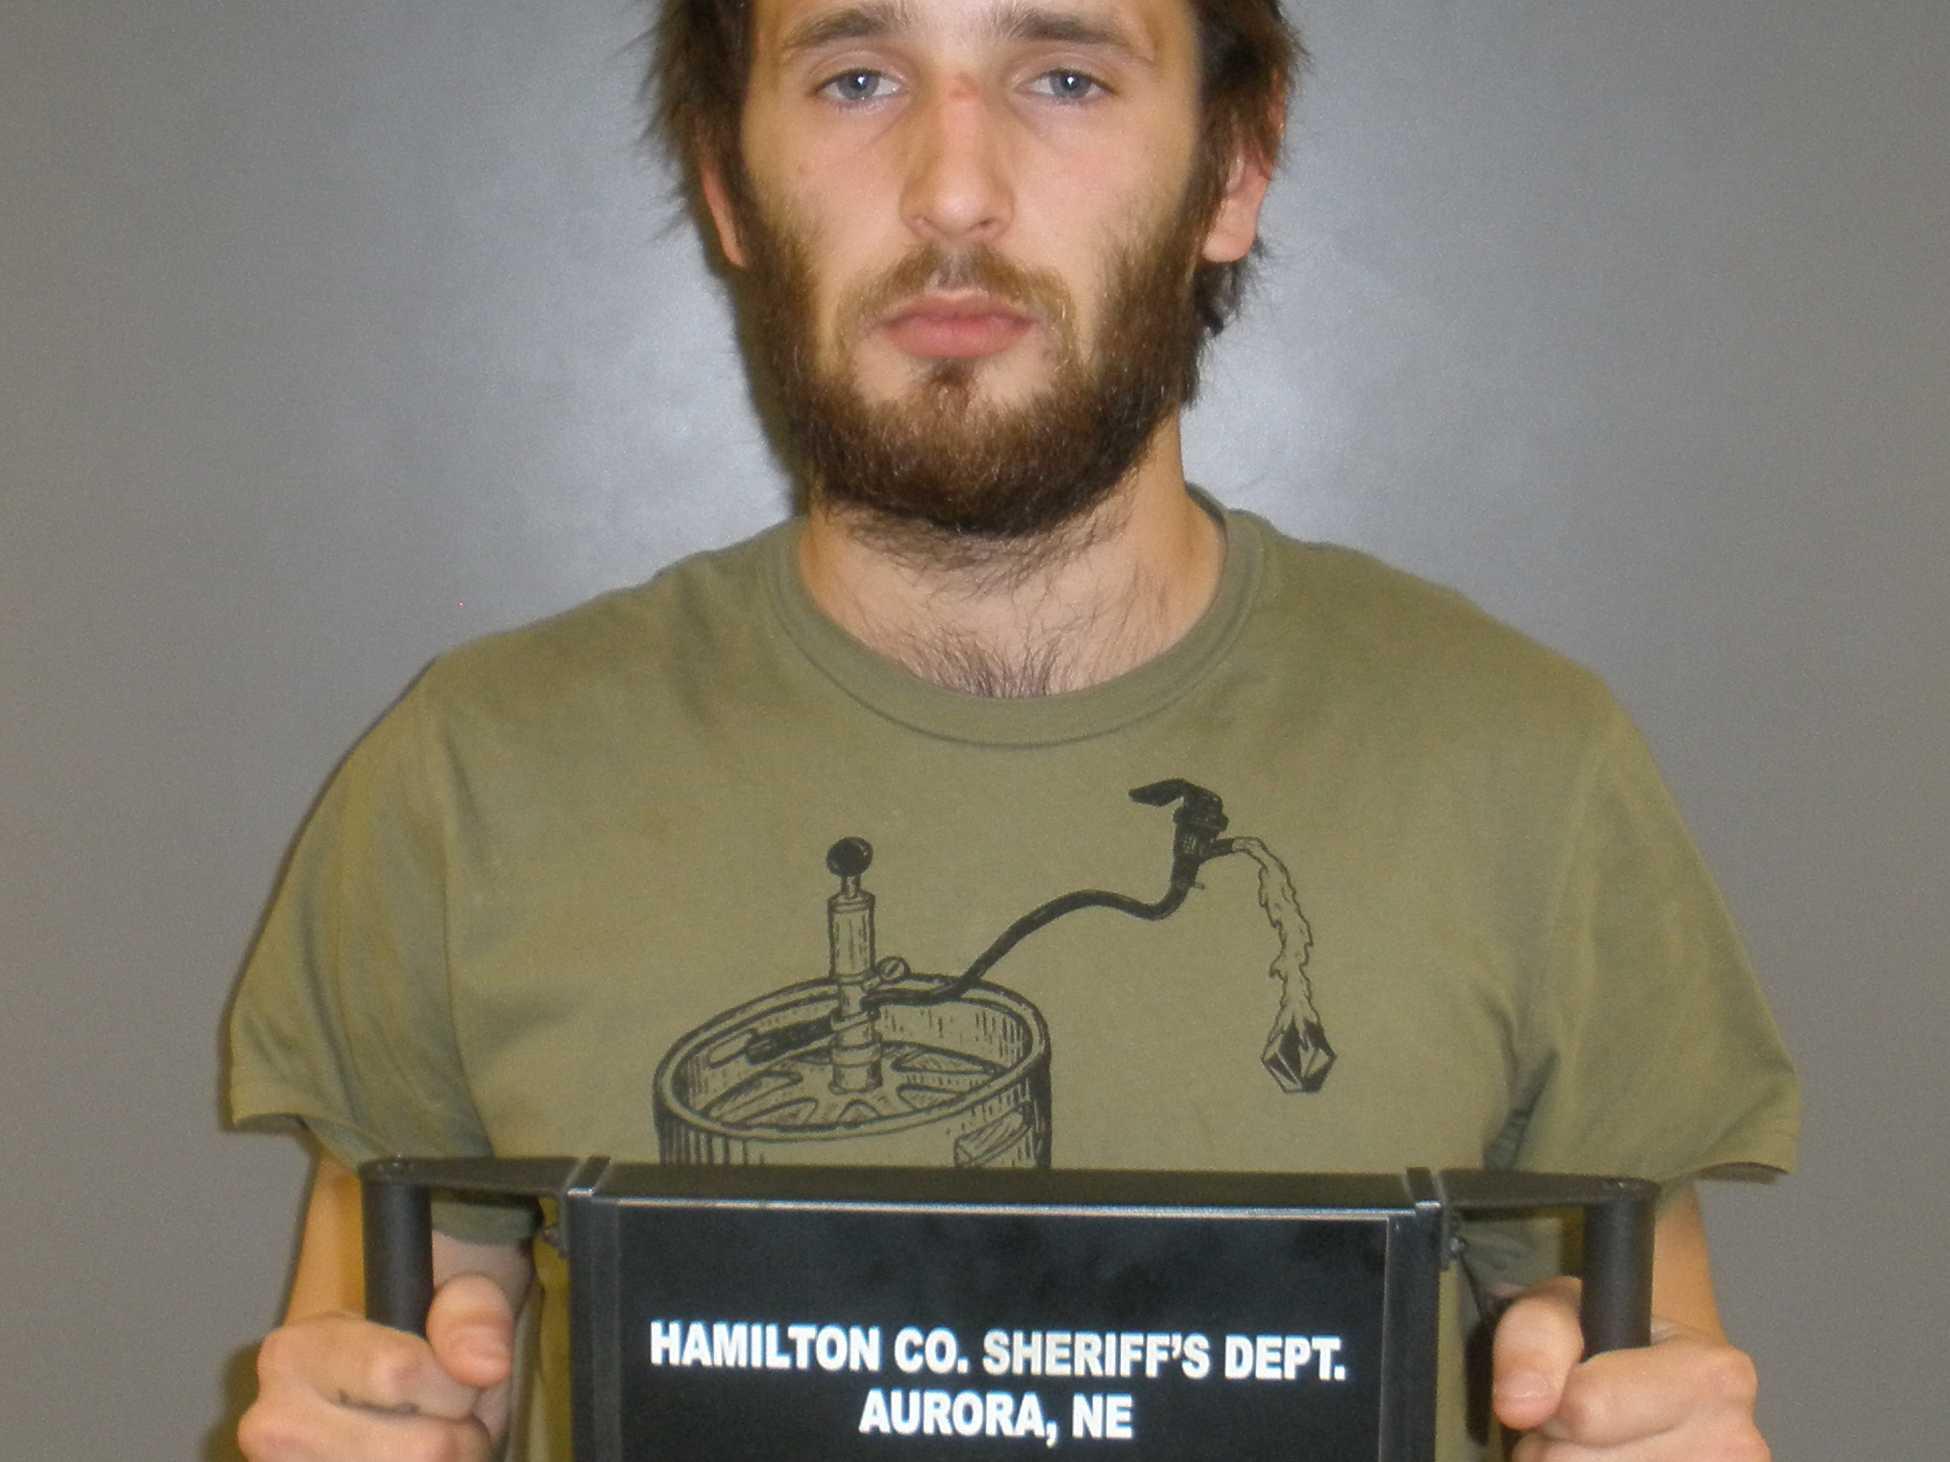 Son of Sean Penn and Robin Wright Arrested in Nebraska